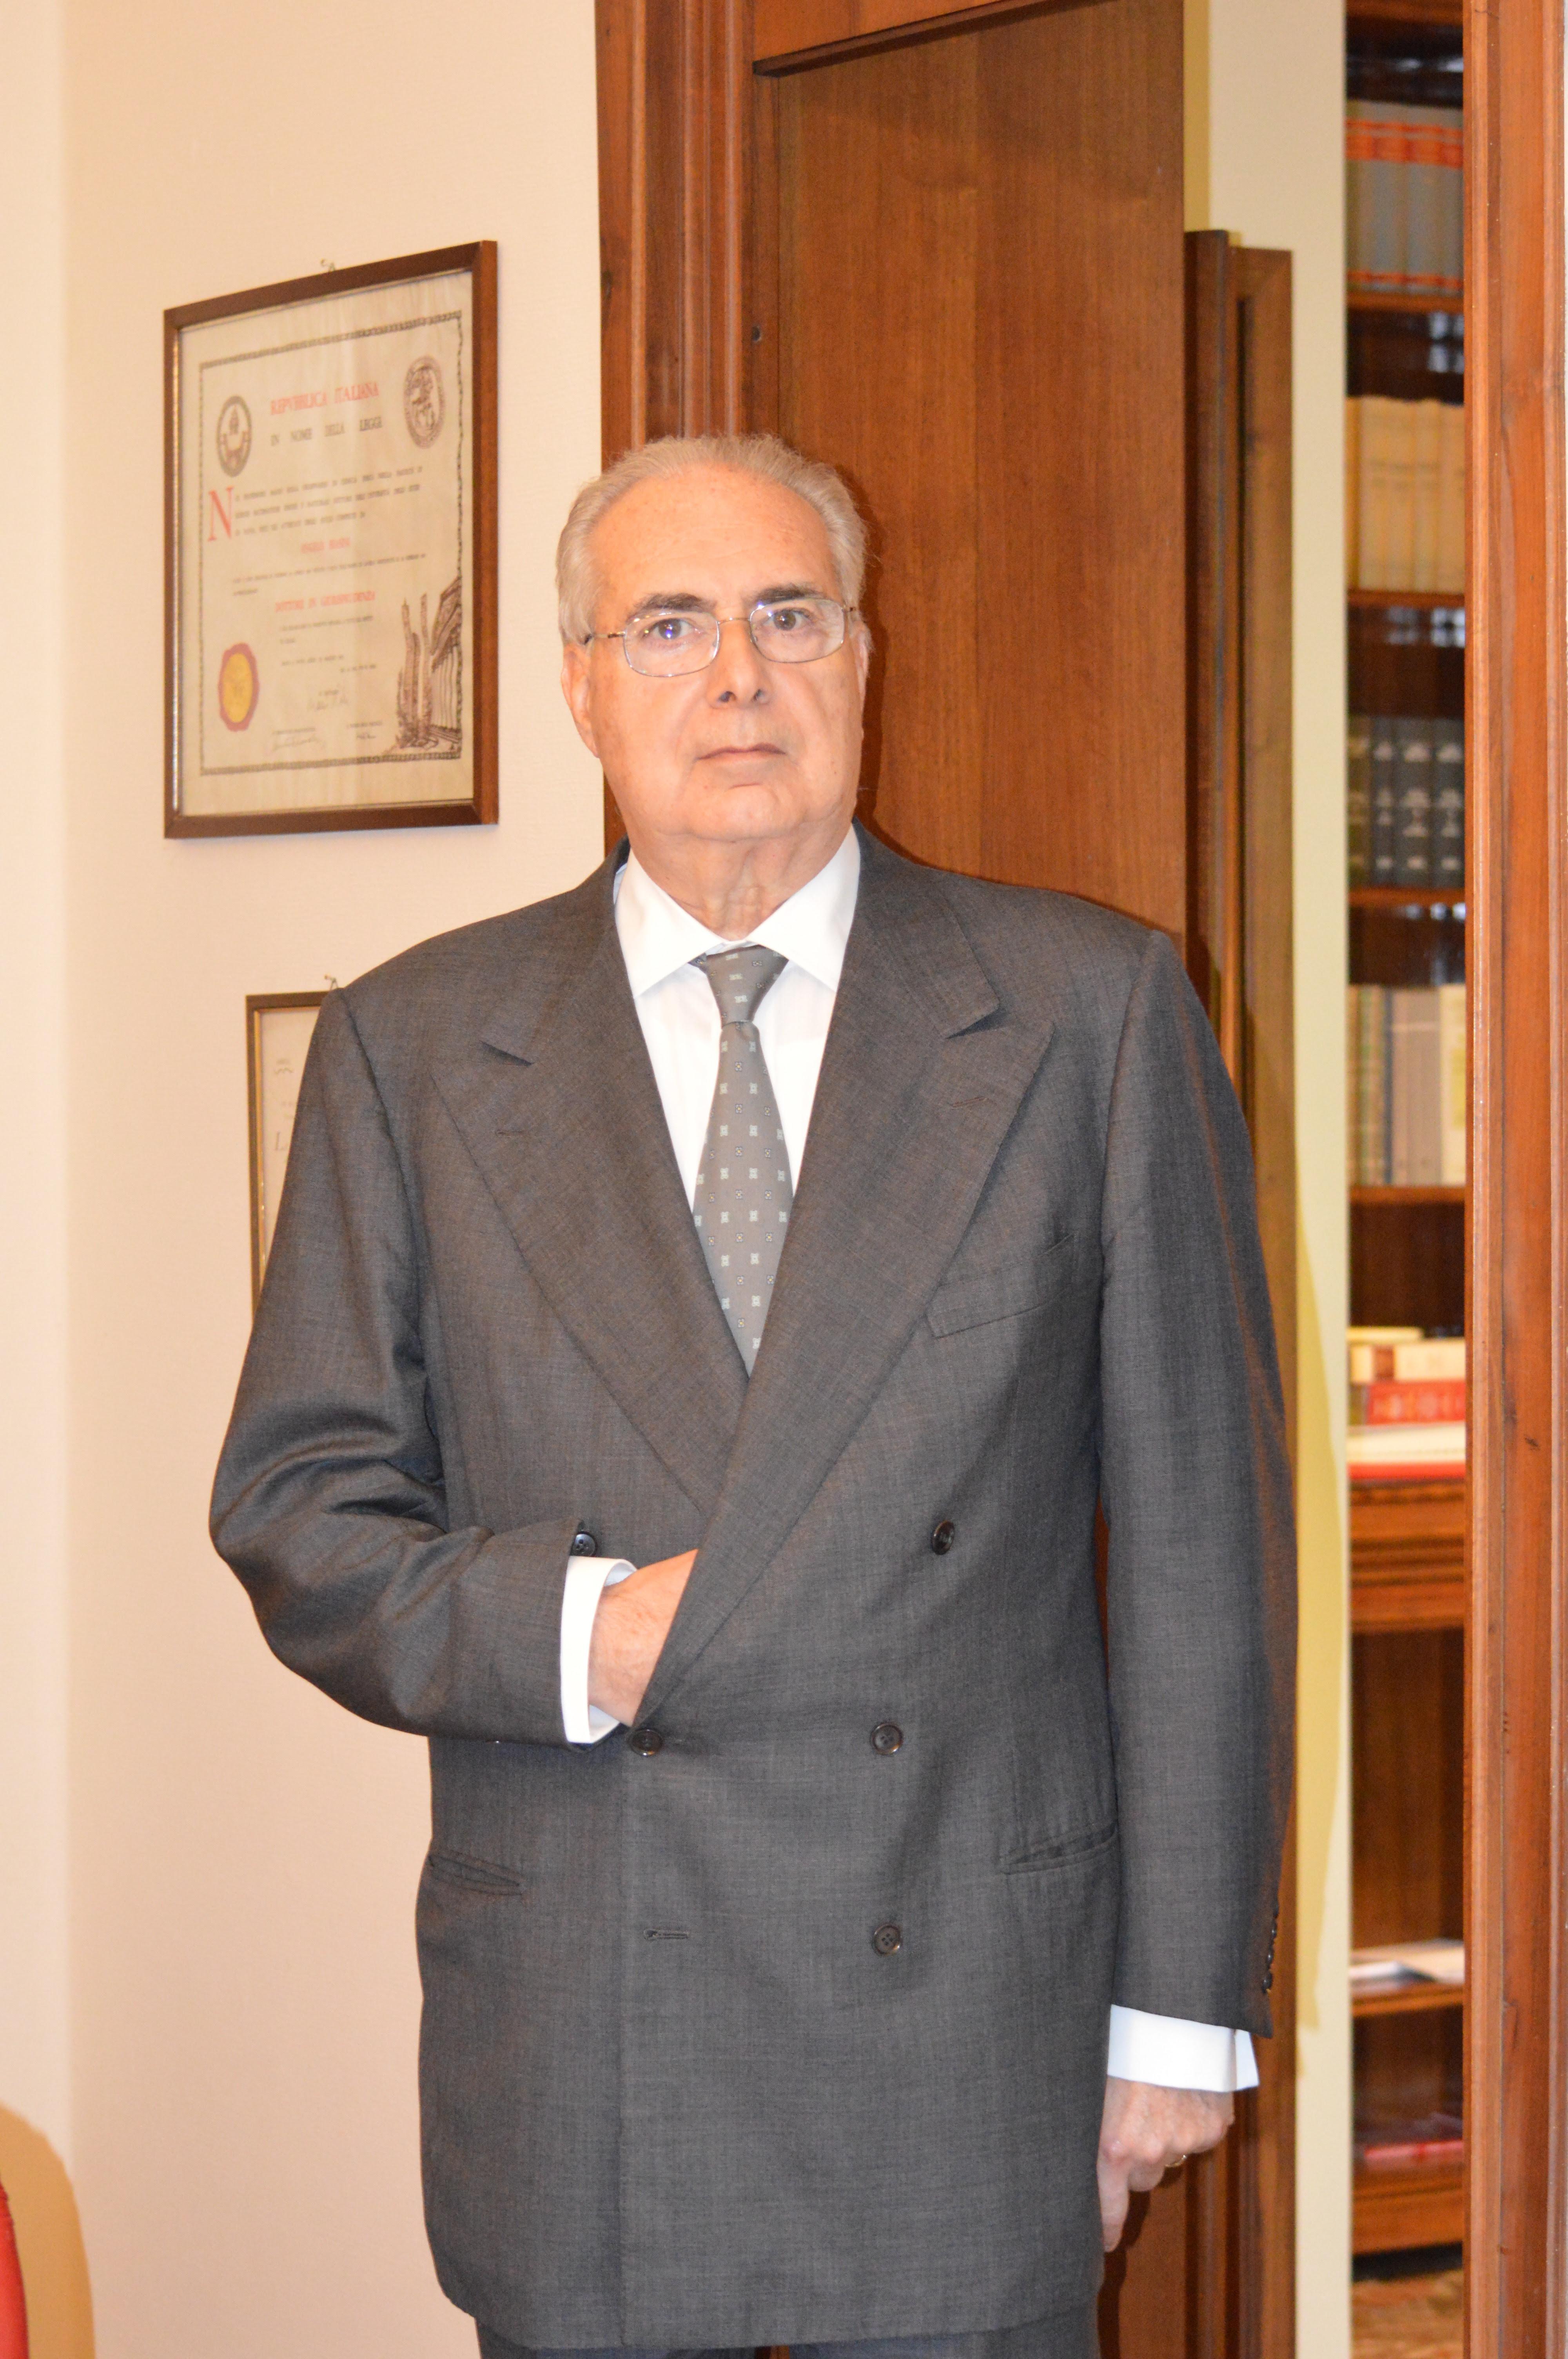 Associazione Lodi Liberale - Angelo Biasini